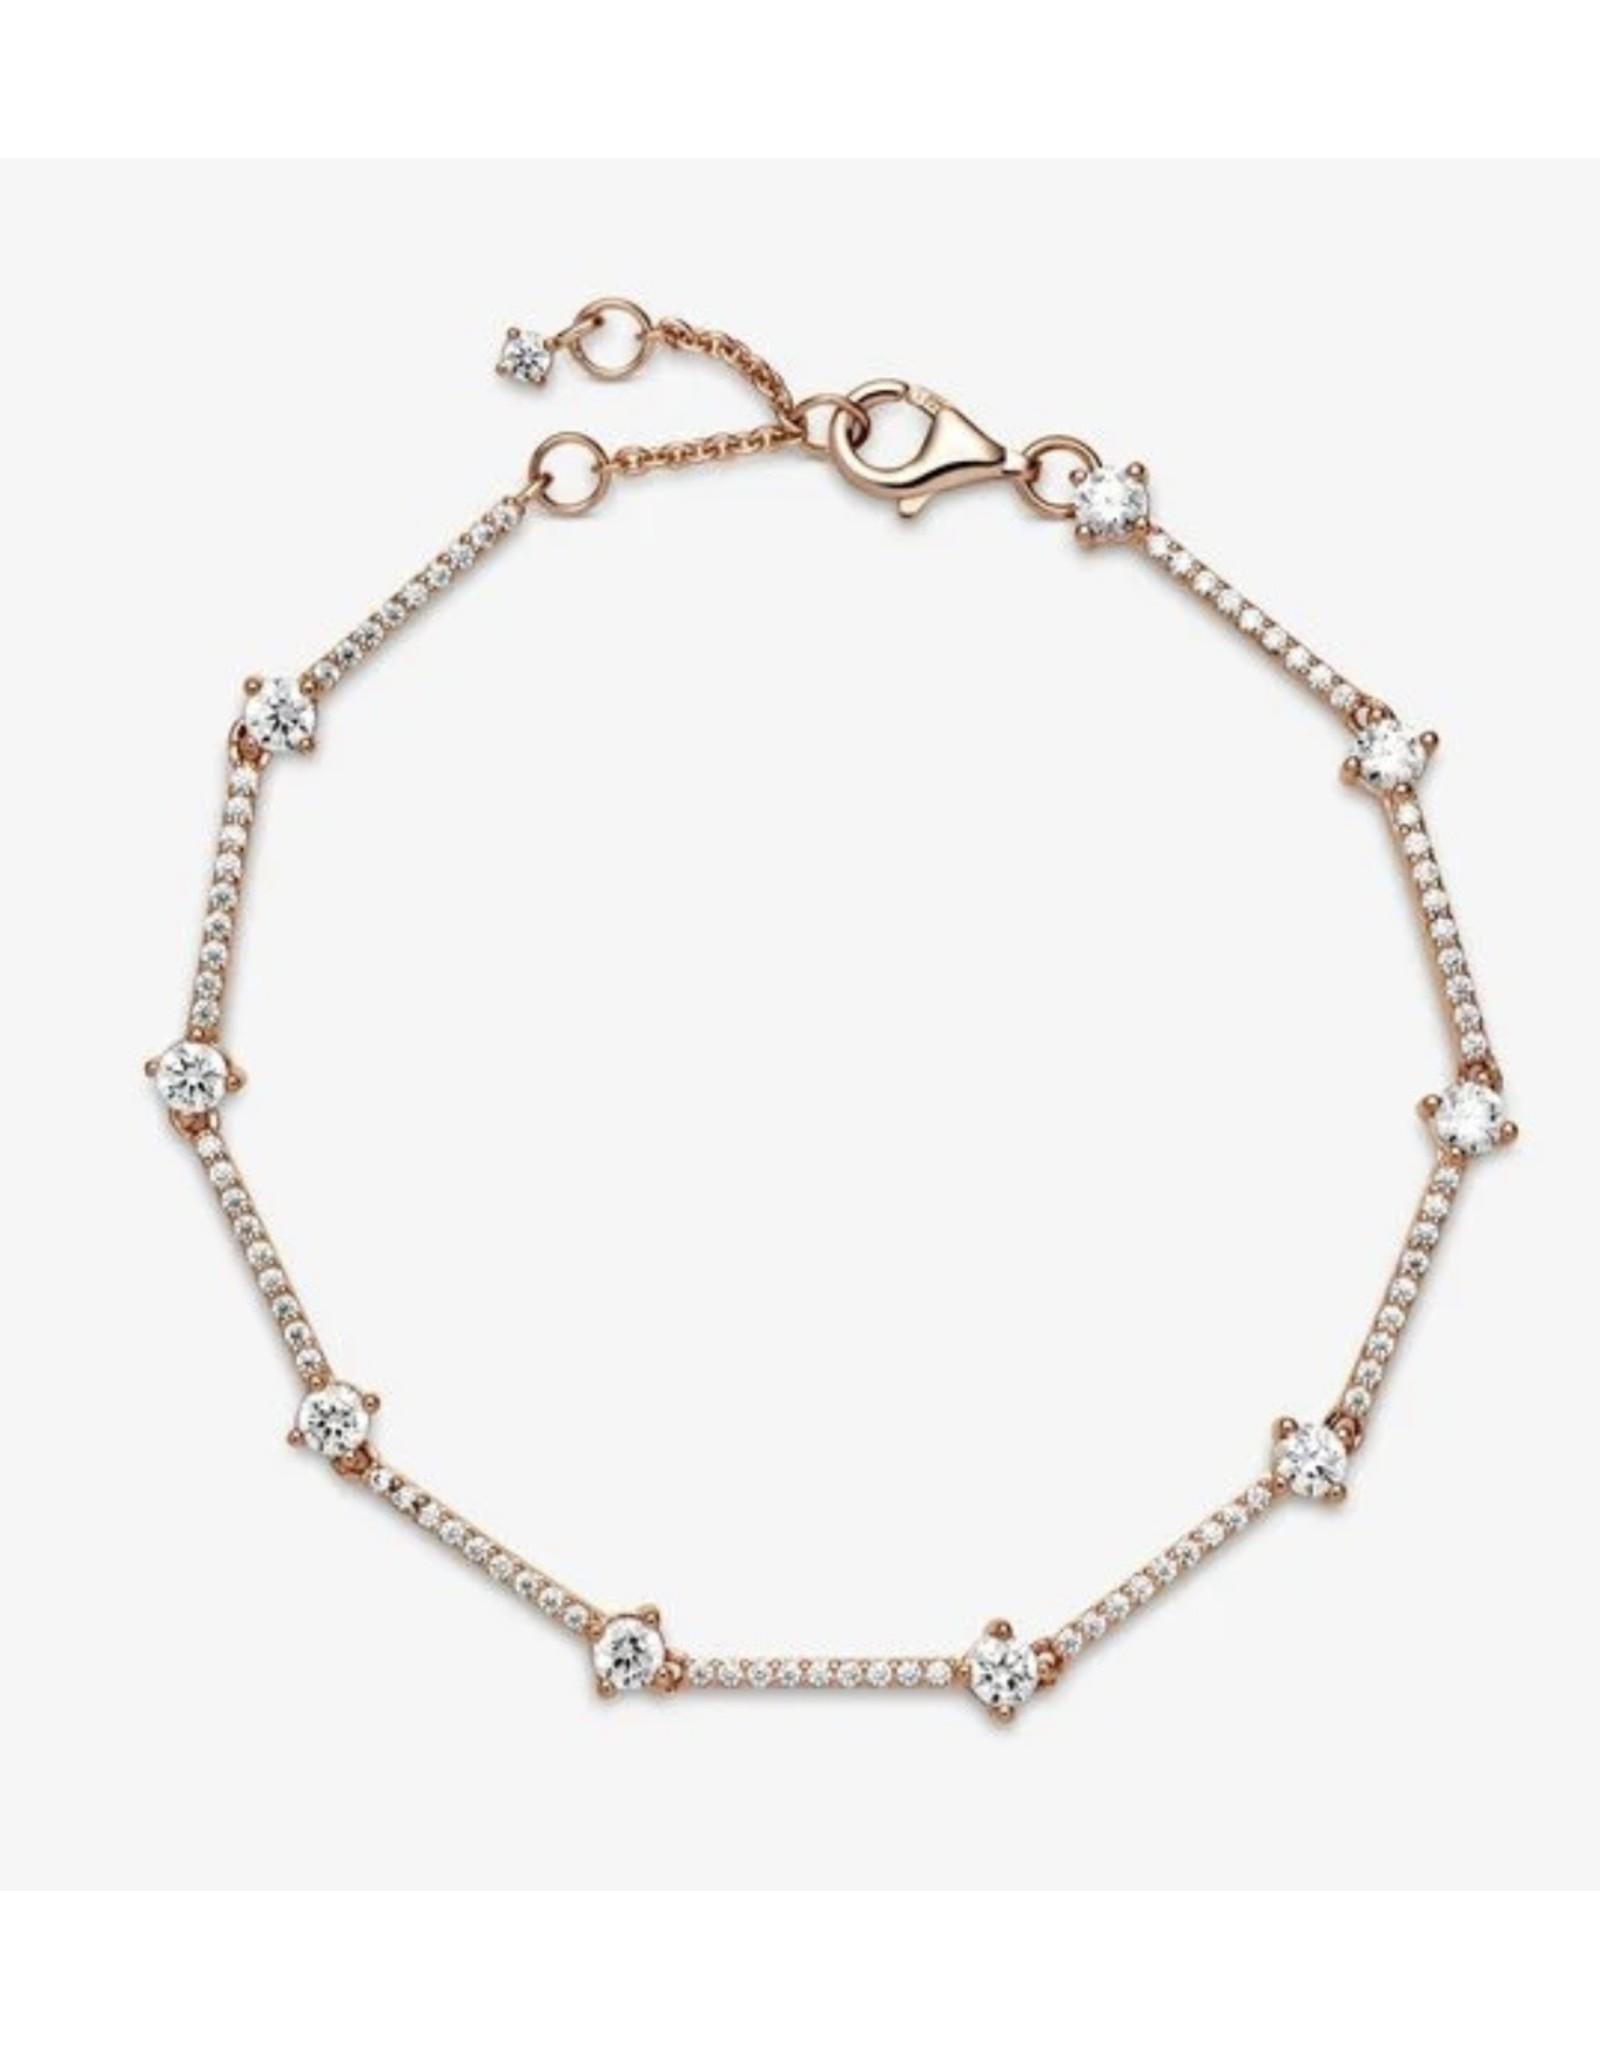 Pandora Pandora Bracelet,589217C01, Sparkling Pave Bars,Rose Gold, Clear CZ